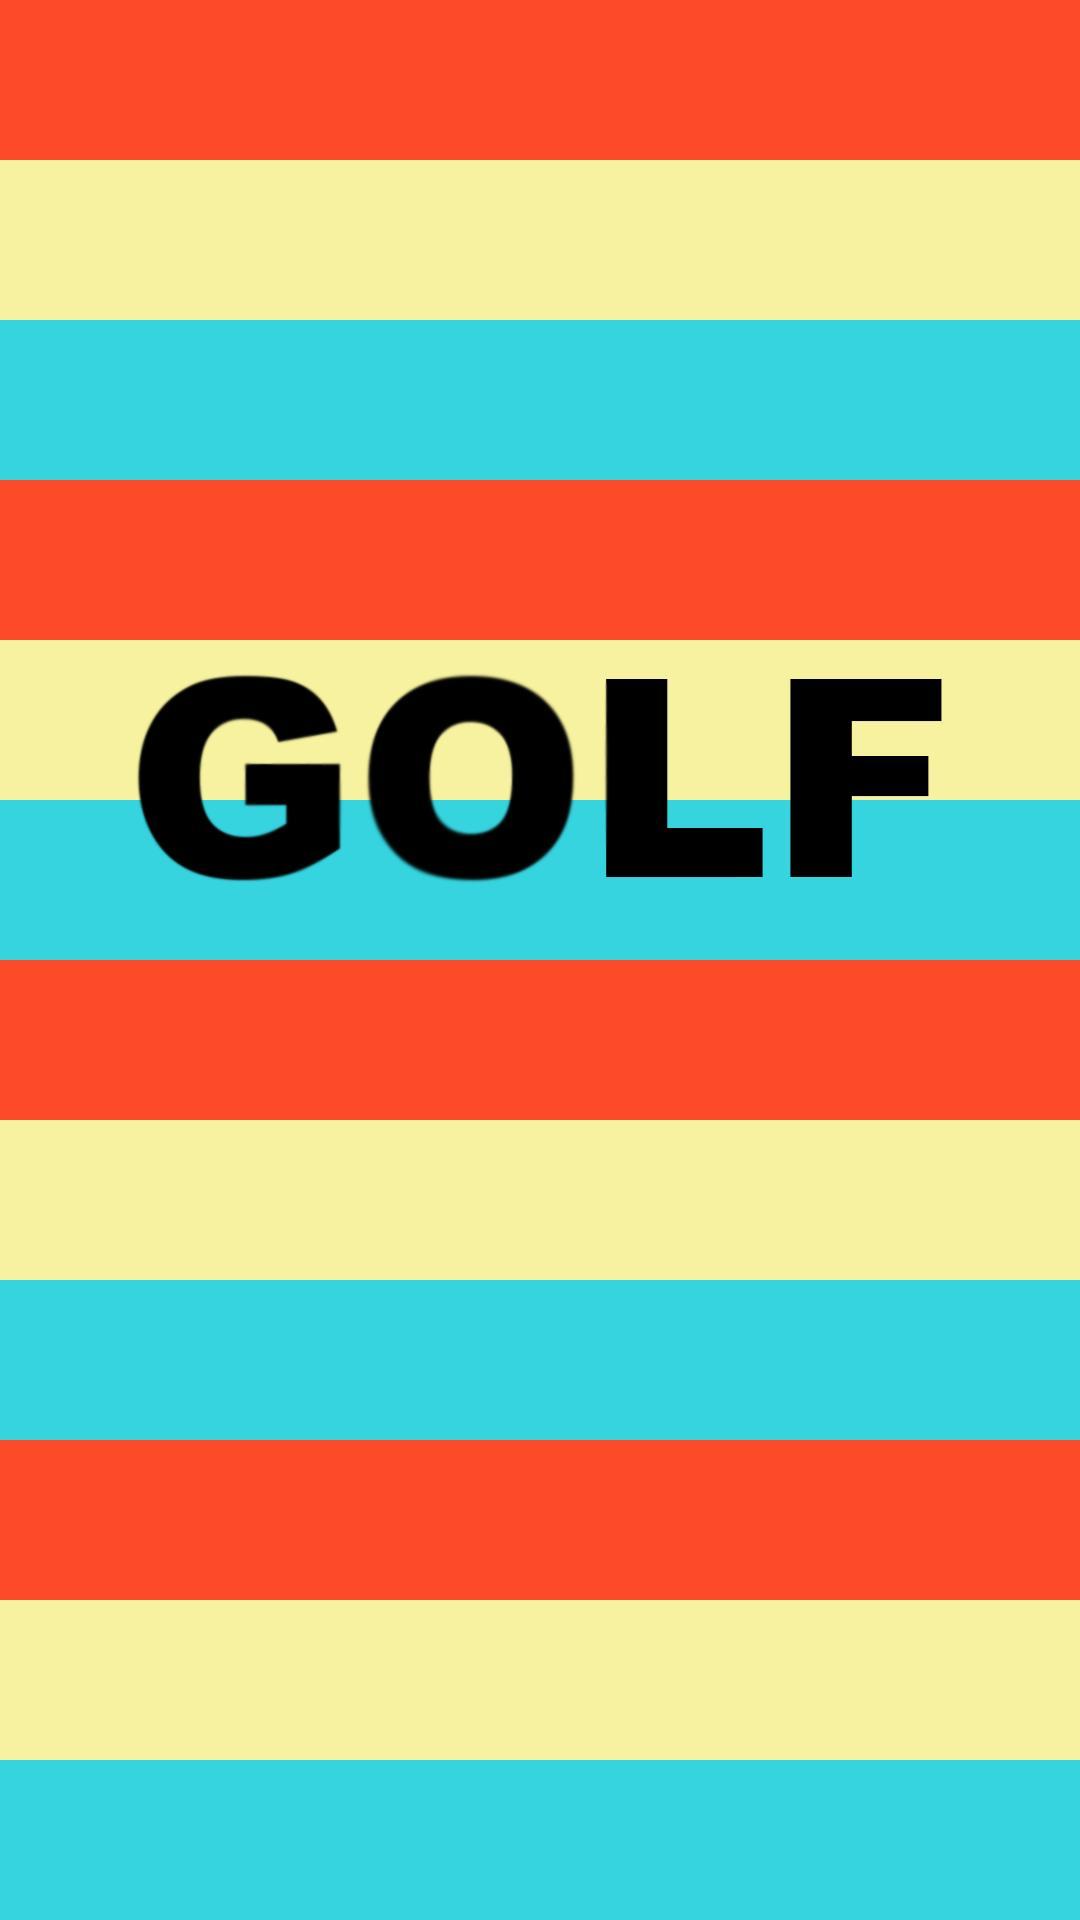 Golf Le Fleur Wallpapers Wallpaper Cave